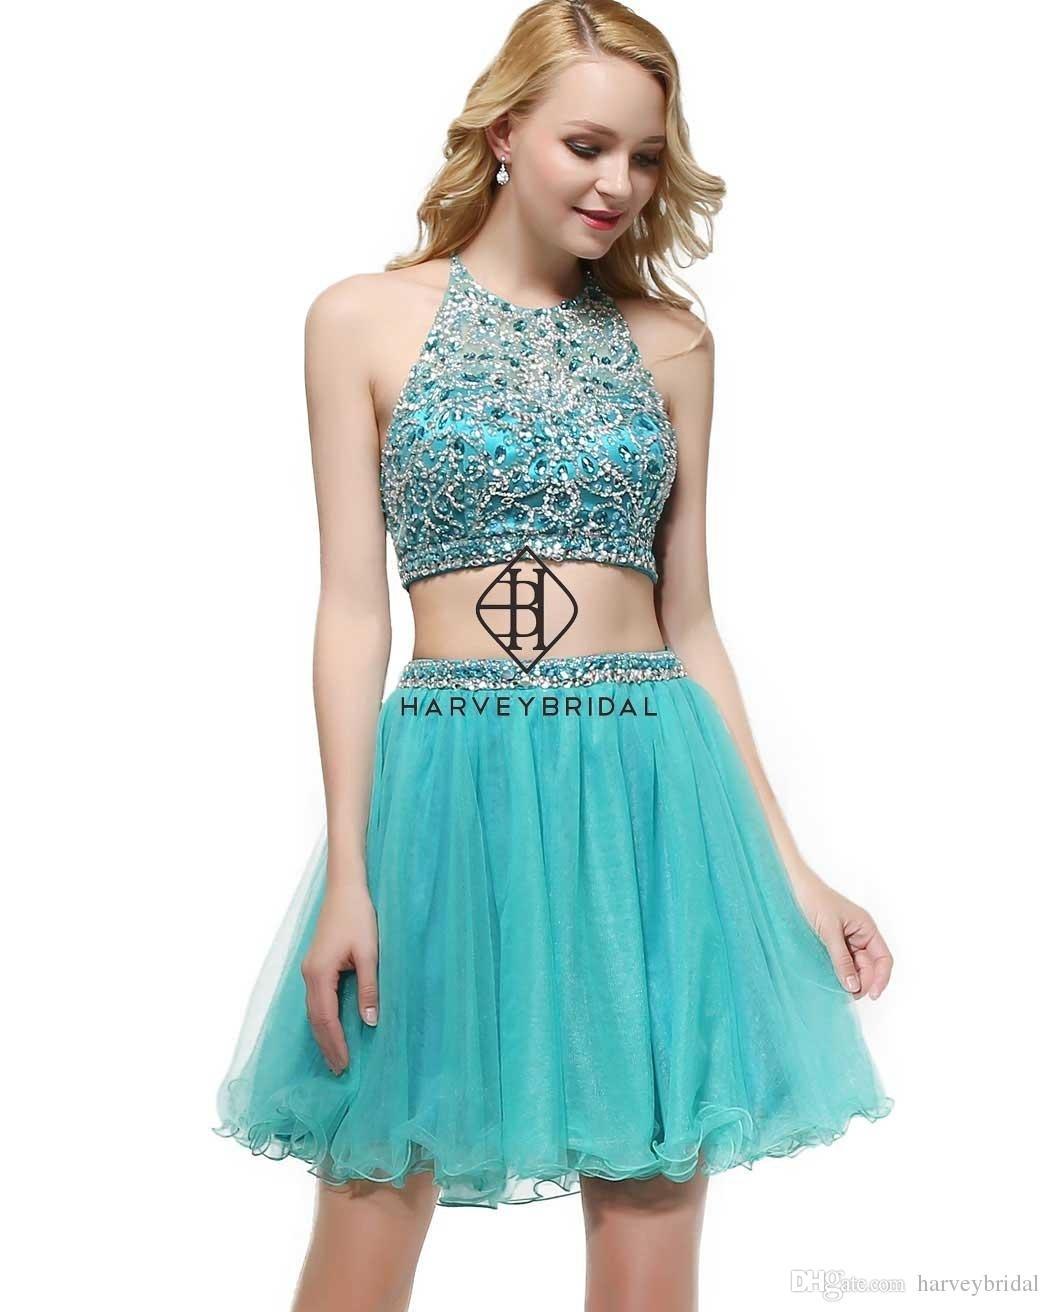 10 Großartig Kleid Mintgrün Kurz Boutique15 Großartig Kleid Mintgrün Kurz Design